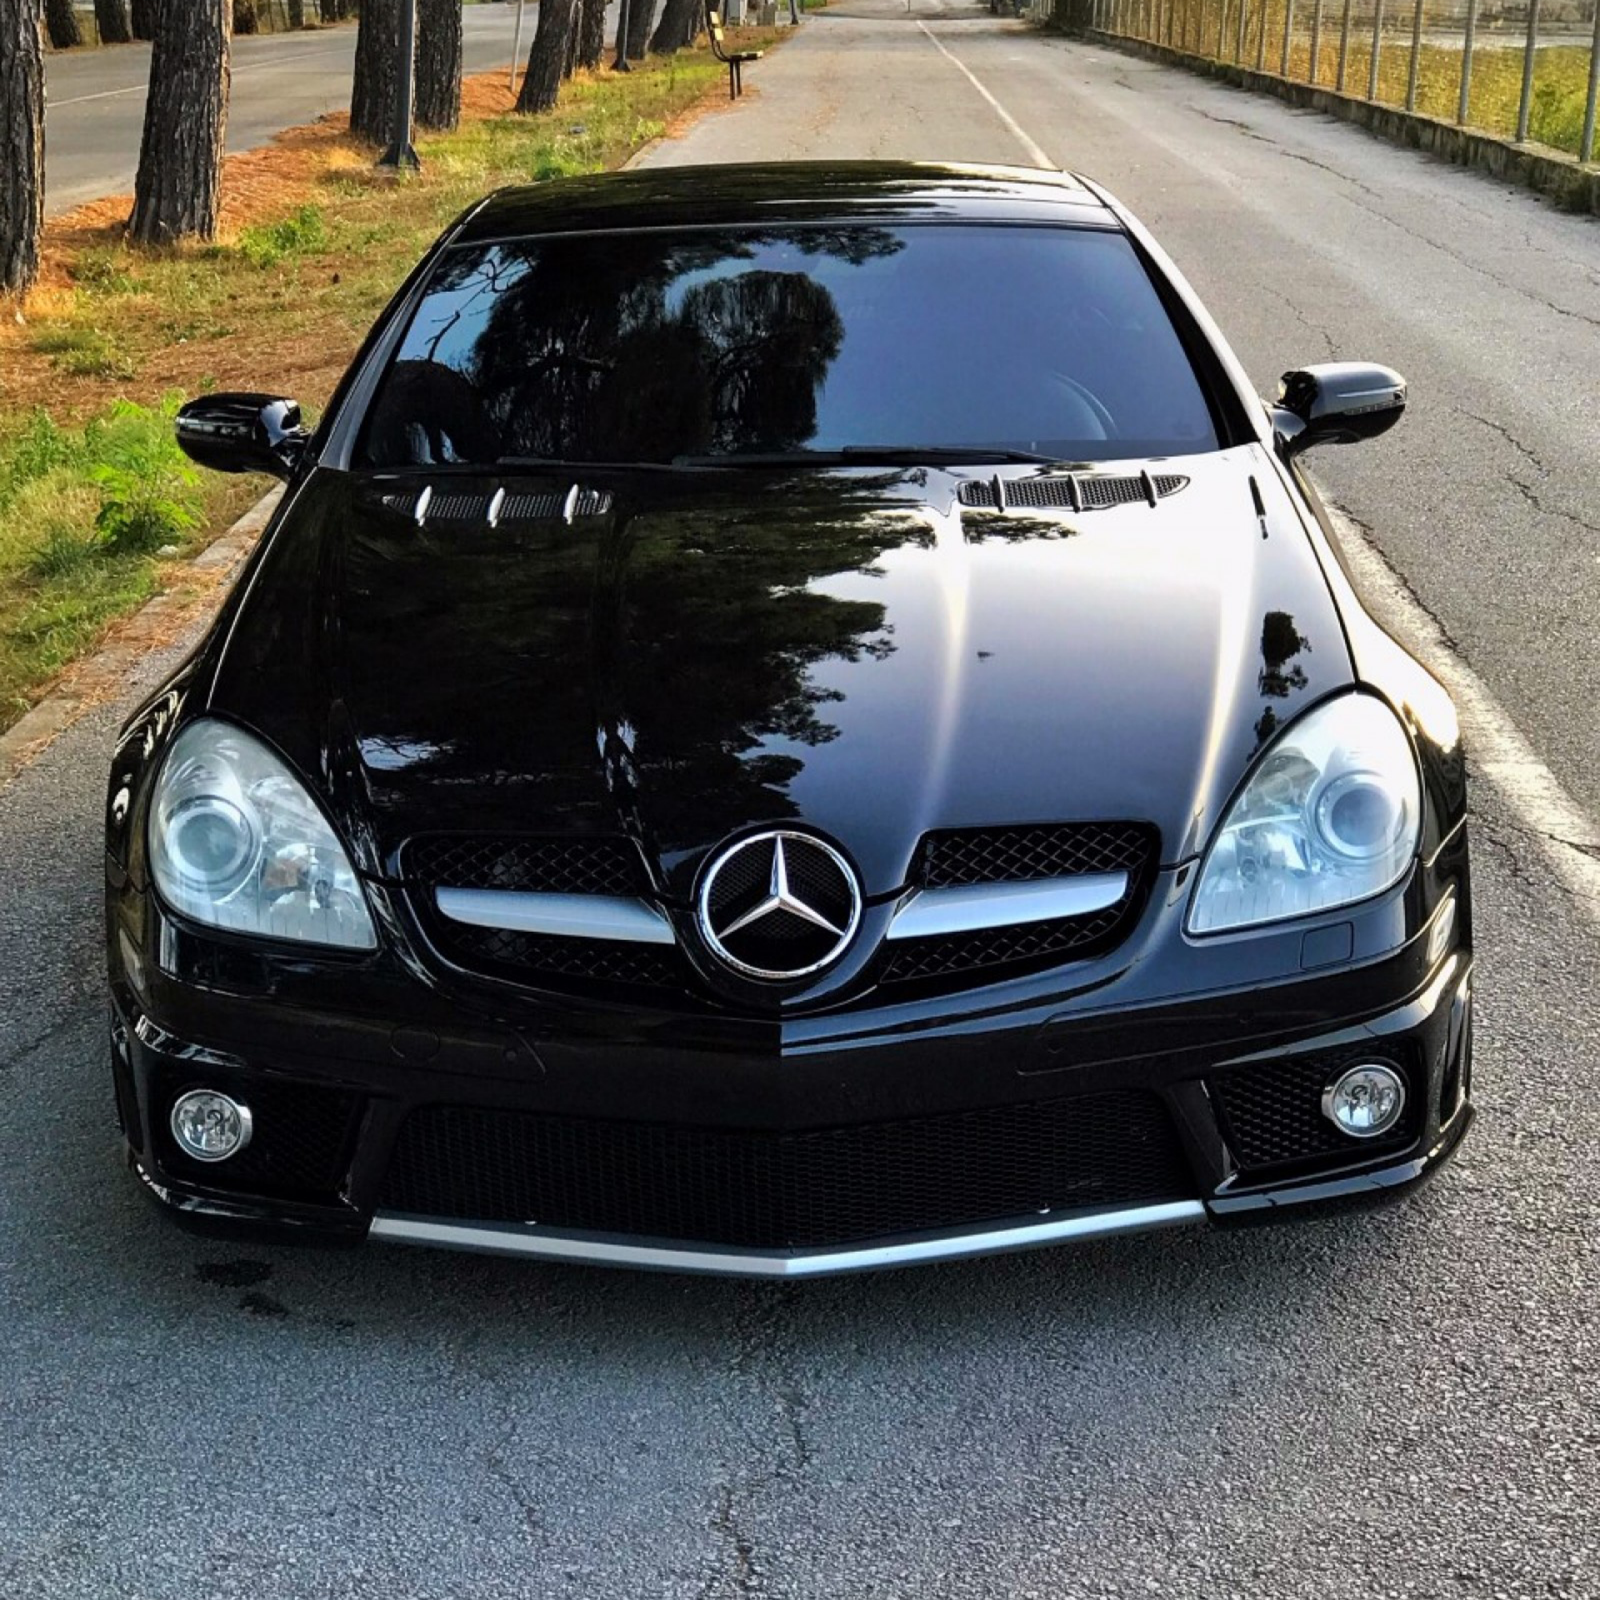 Mercedes SLK 200 R171 AMG Edition